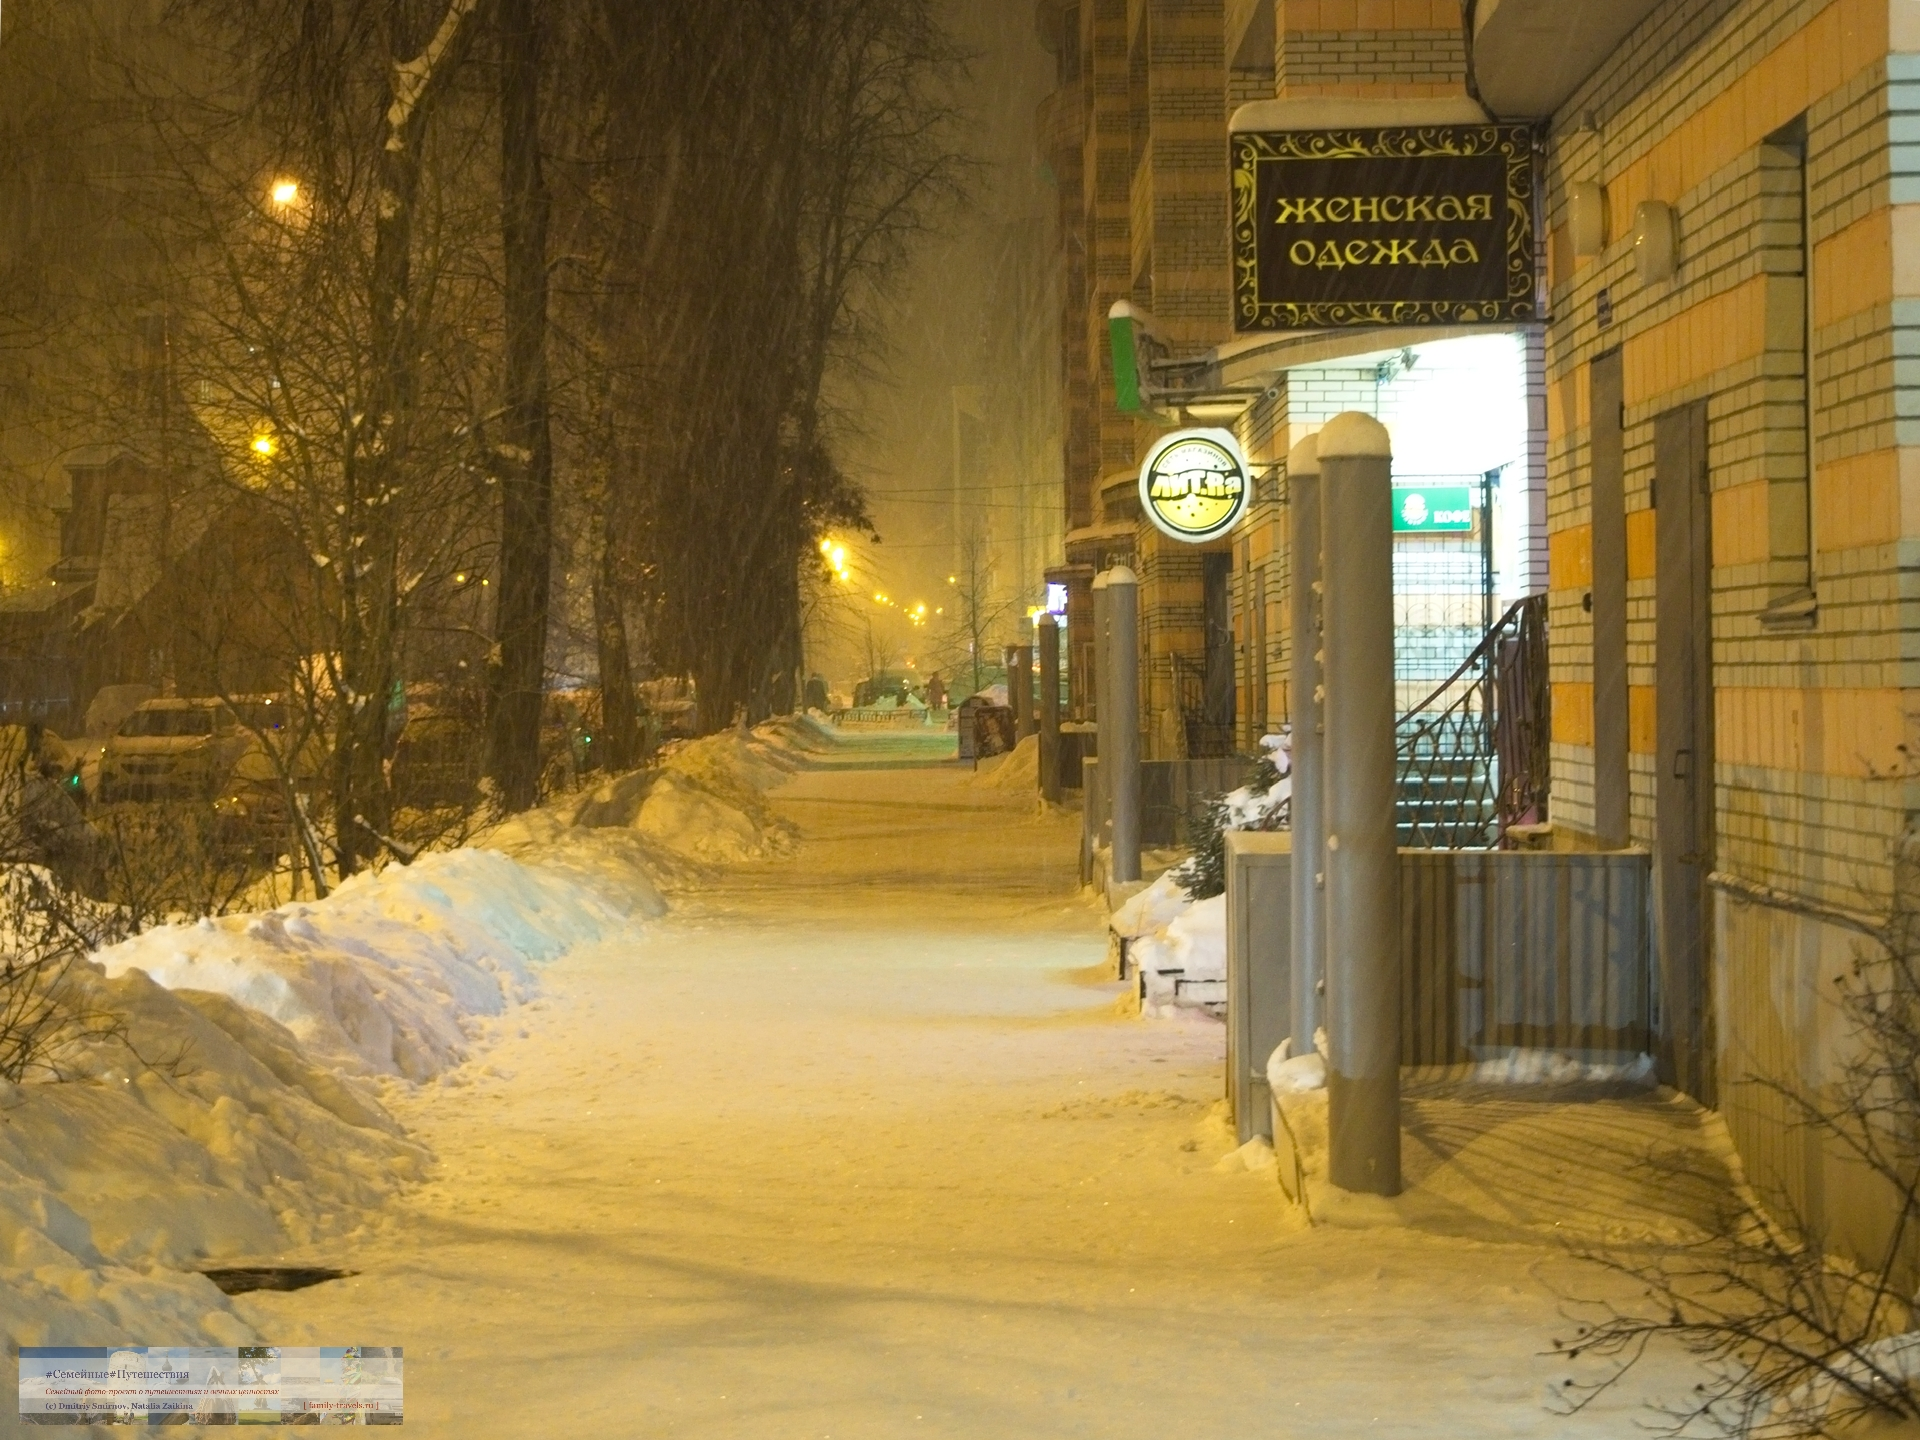 02022018-1900-Blog-035 Просто фото  Снегопад года